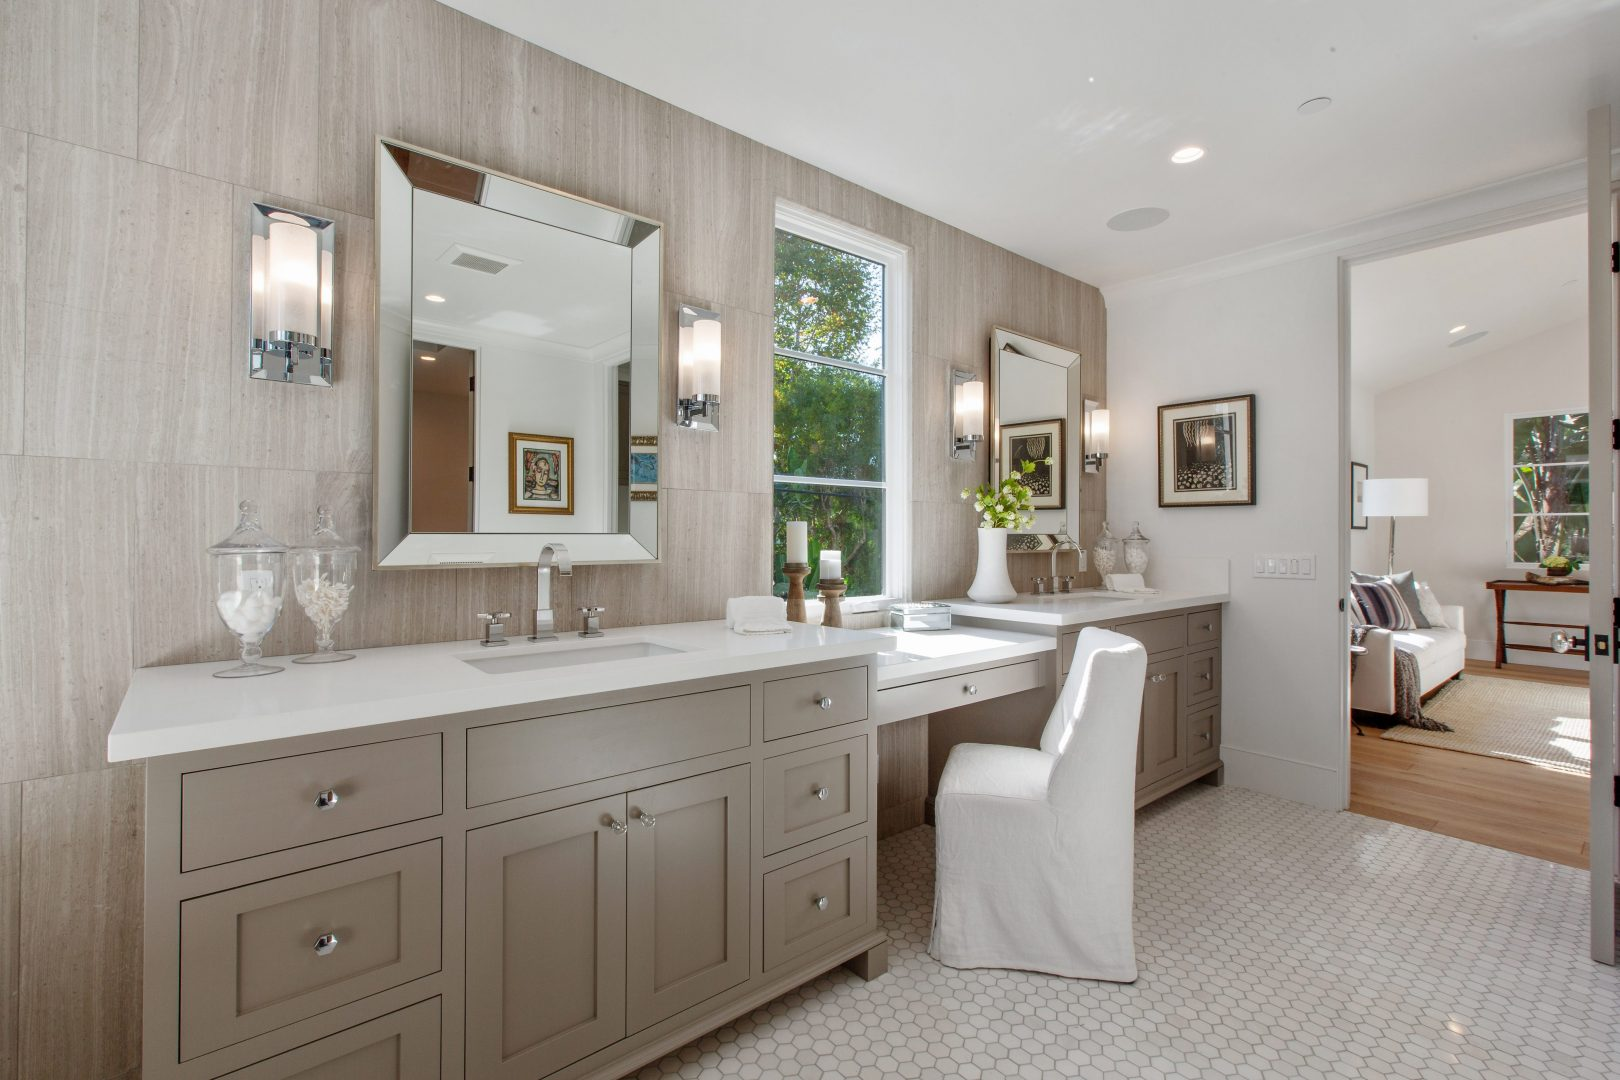 2343 Selby Master Bathroom 4